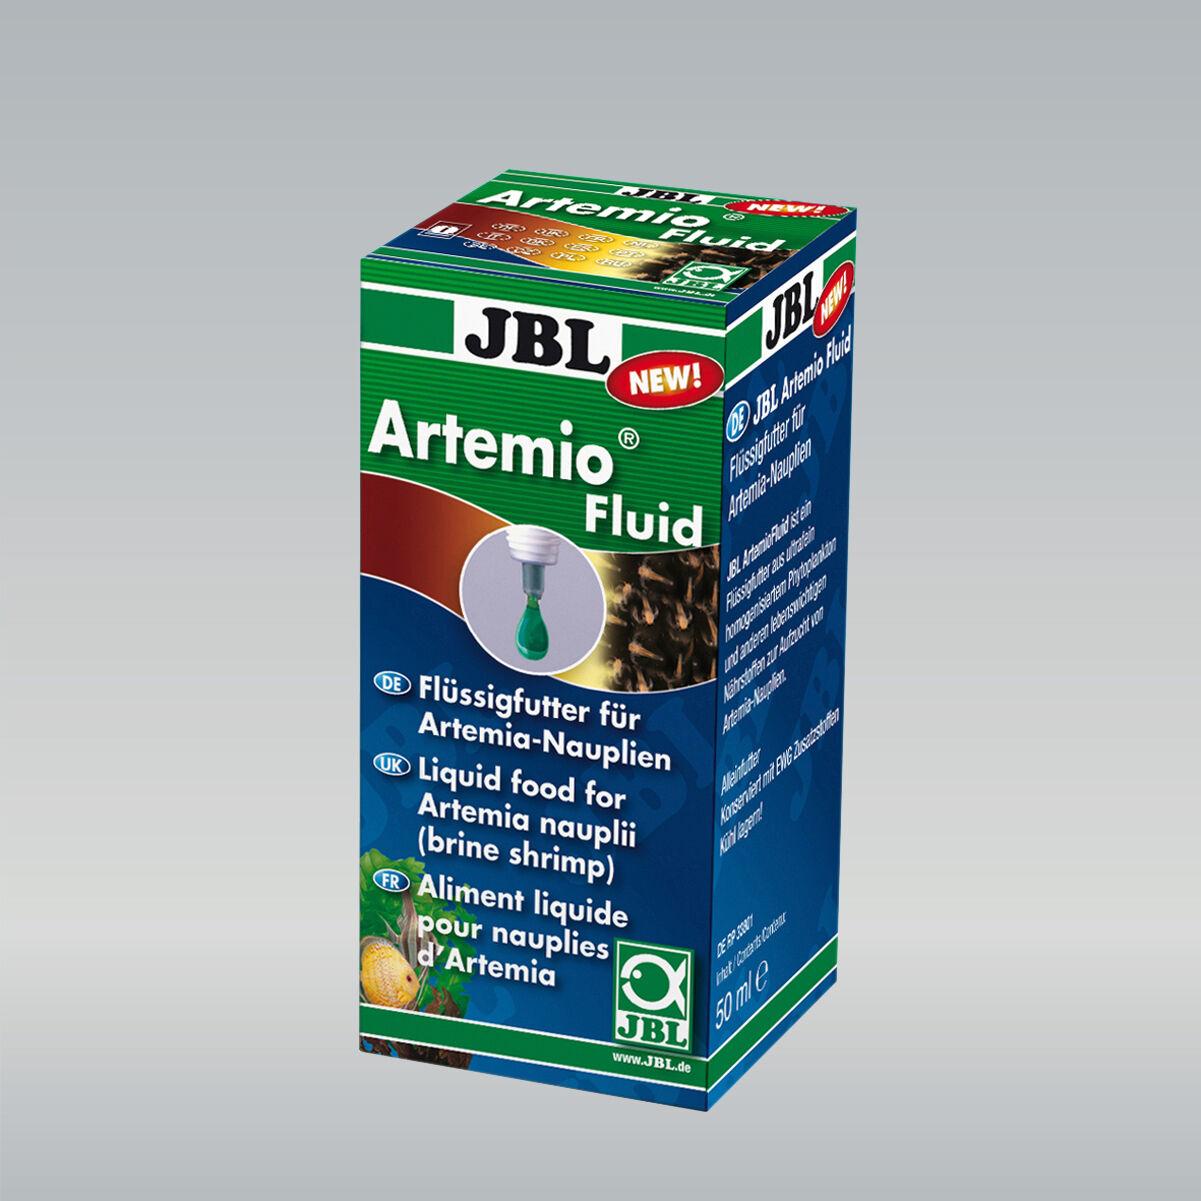 Jbl Artemiofluid Liquid Fodder For Artemia Nauplii 50 Ml Food Ebay Instant Norton Secured Powered By Verisign